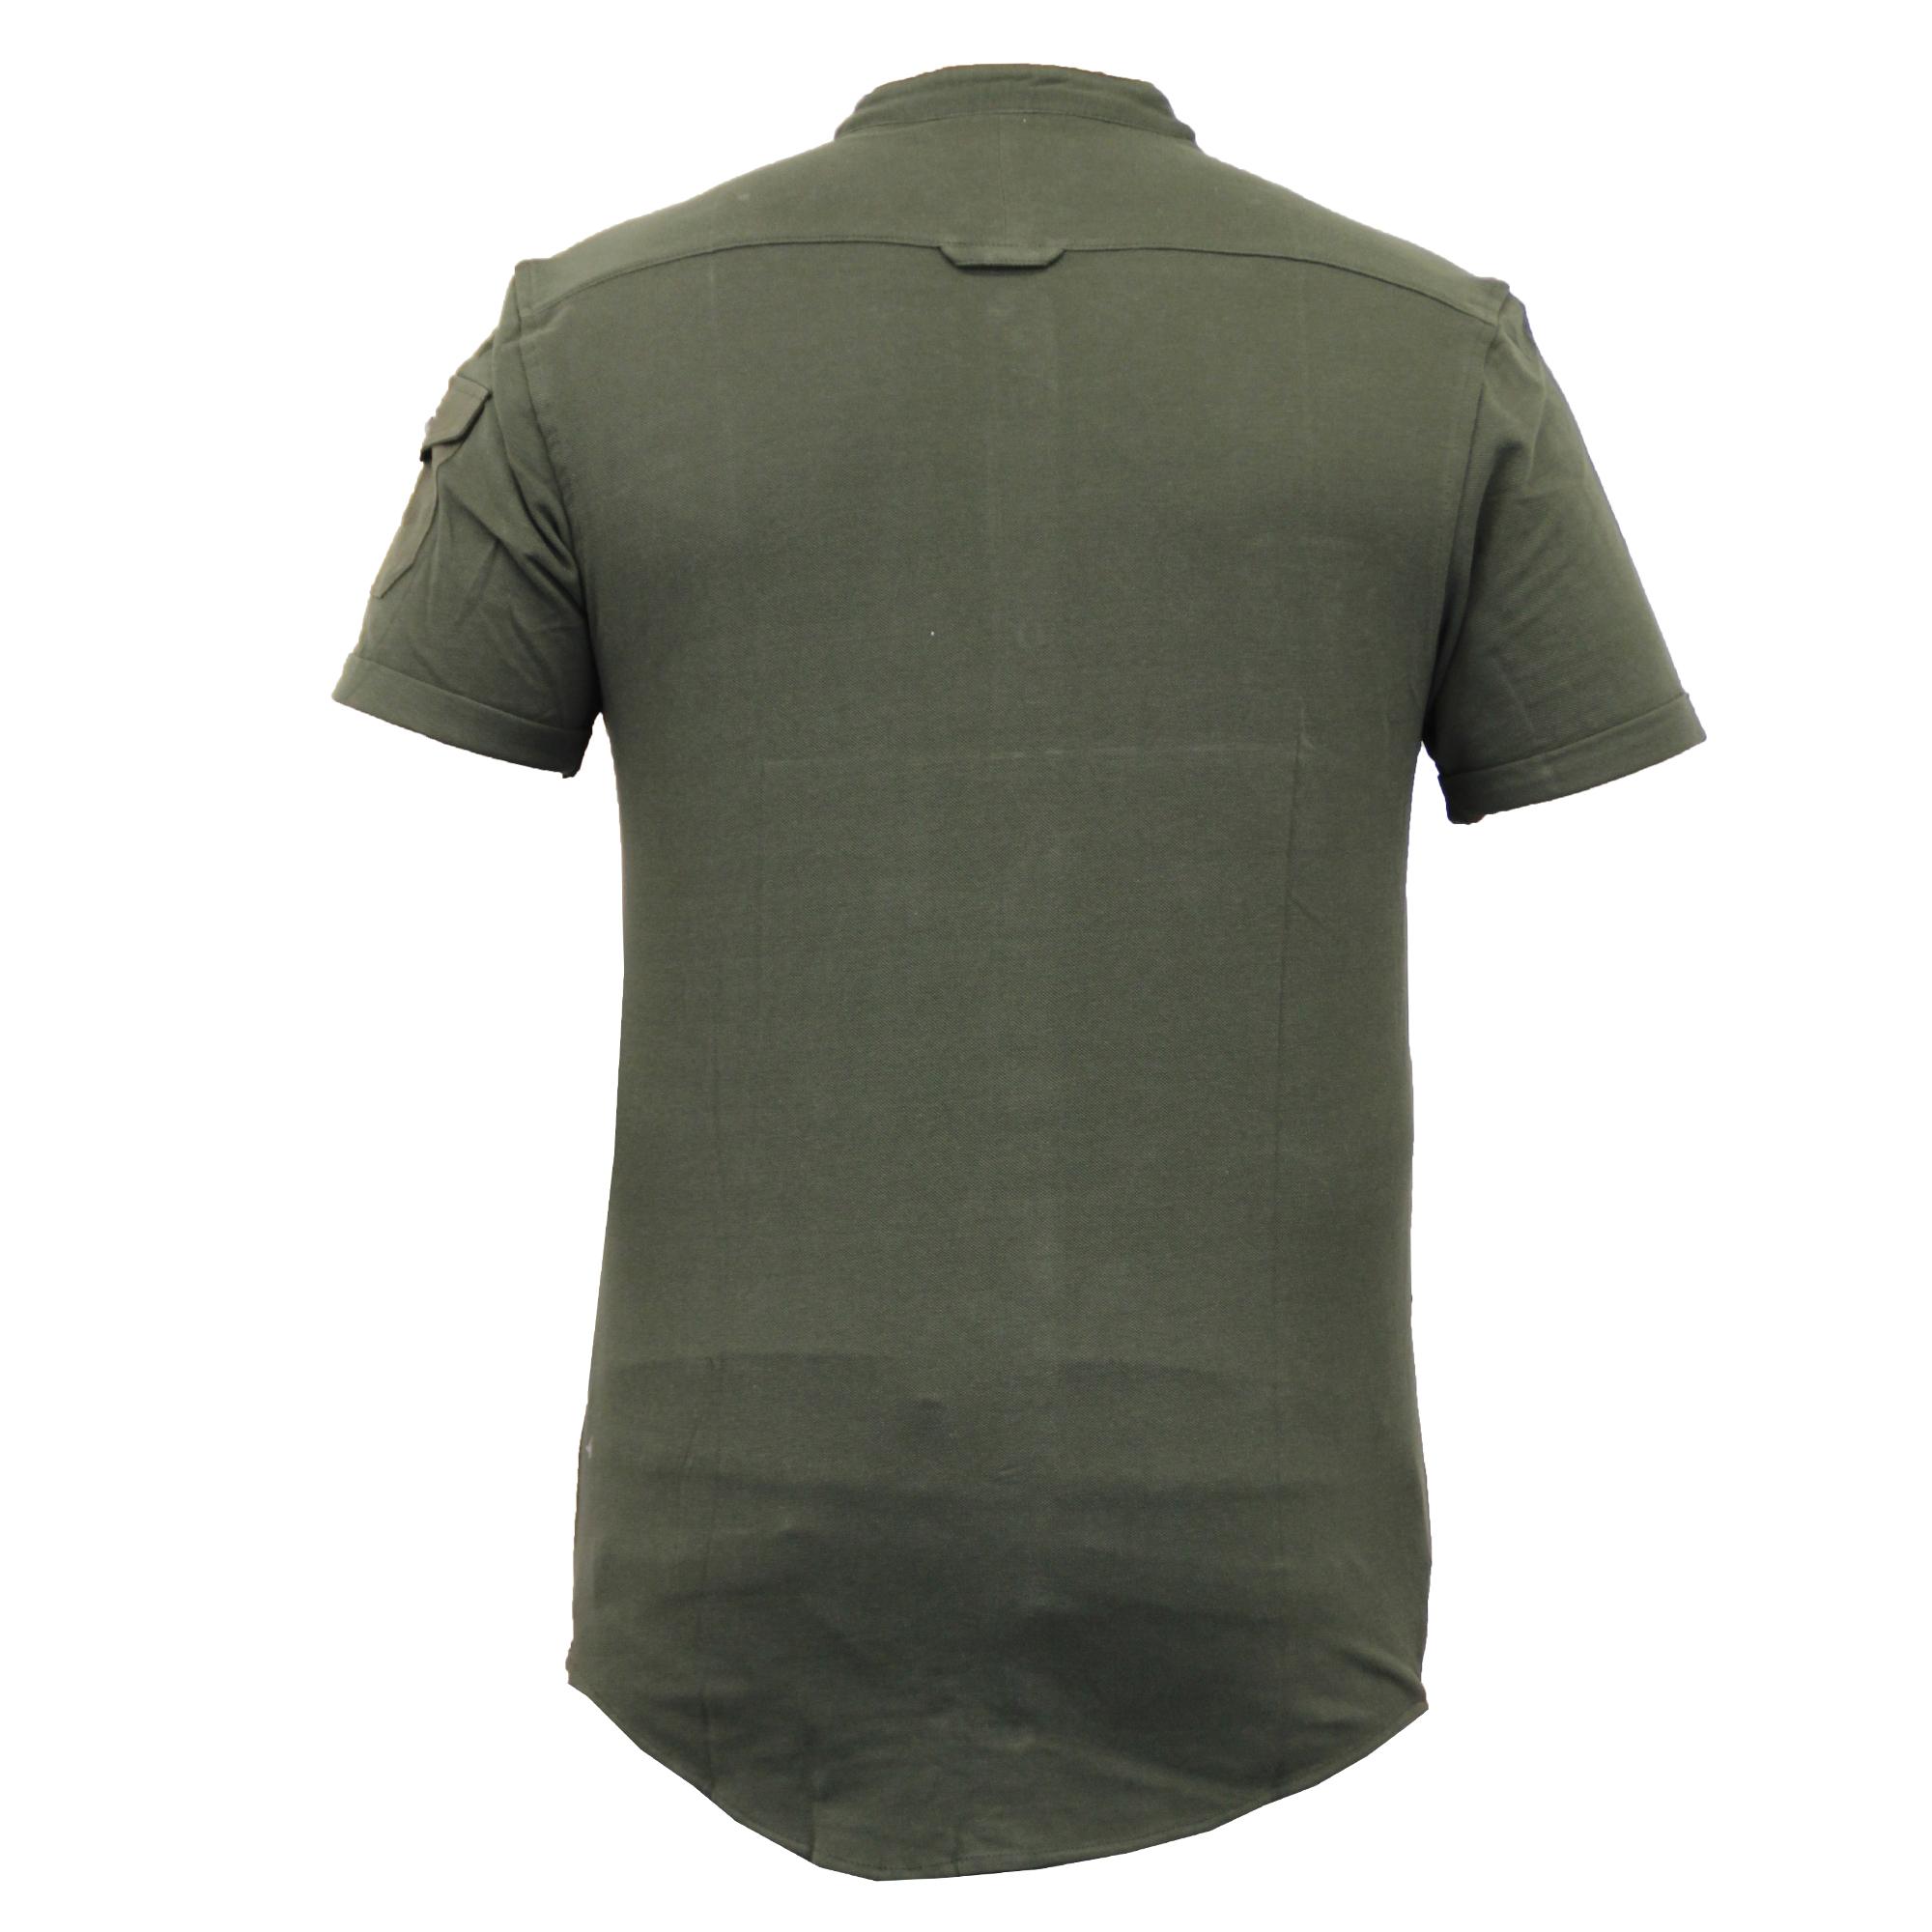 Mens-Linen-Shirt-Threadbare-Short-Sleeved-Brave-Soul-Collared-Casual-Summer-New thumbnail 7